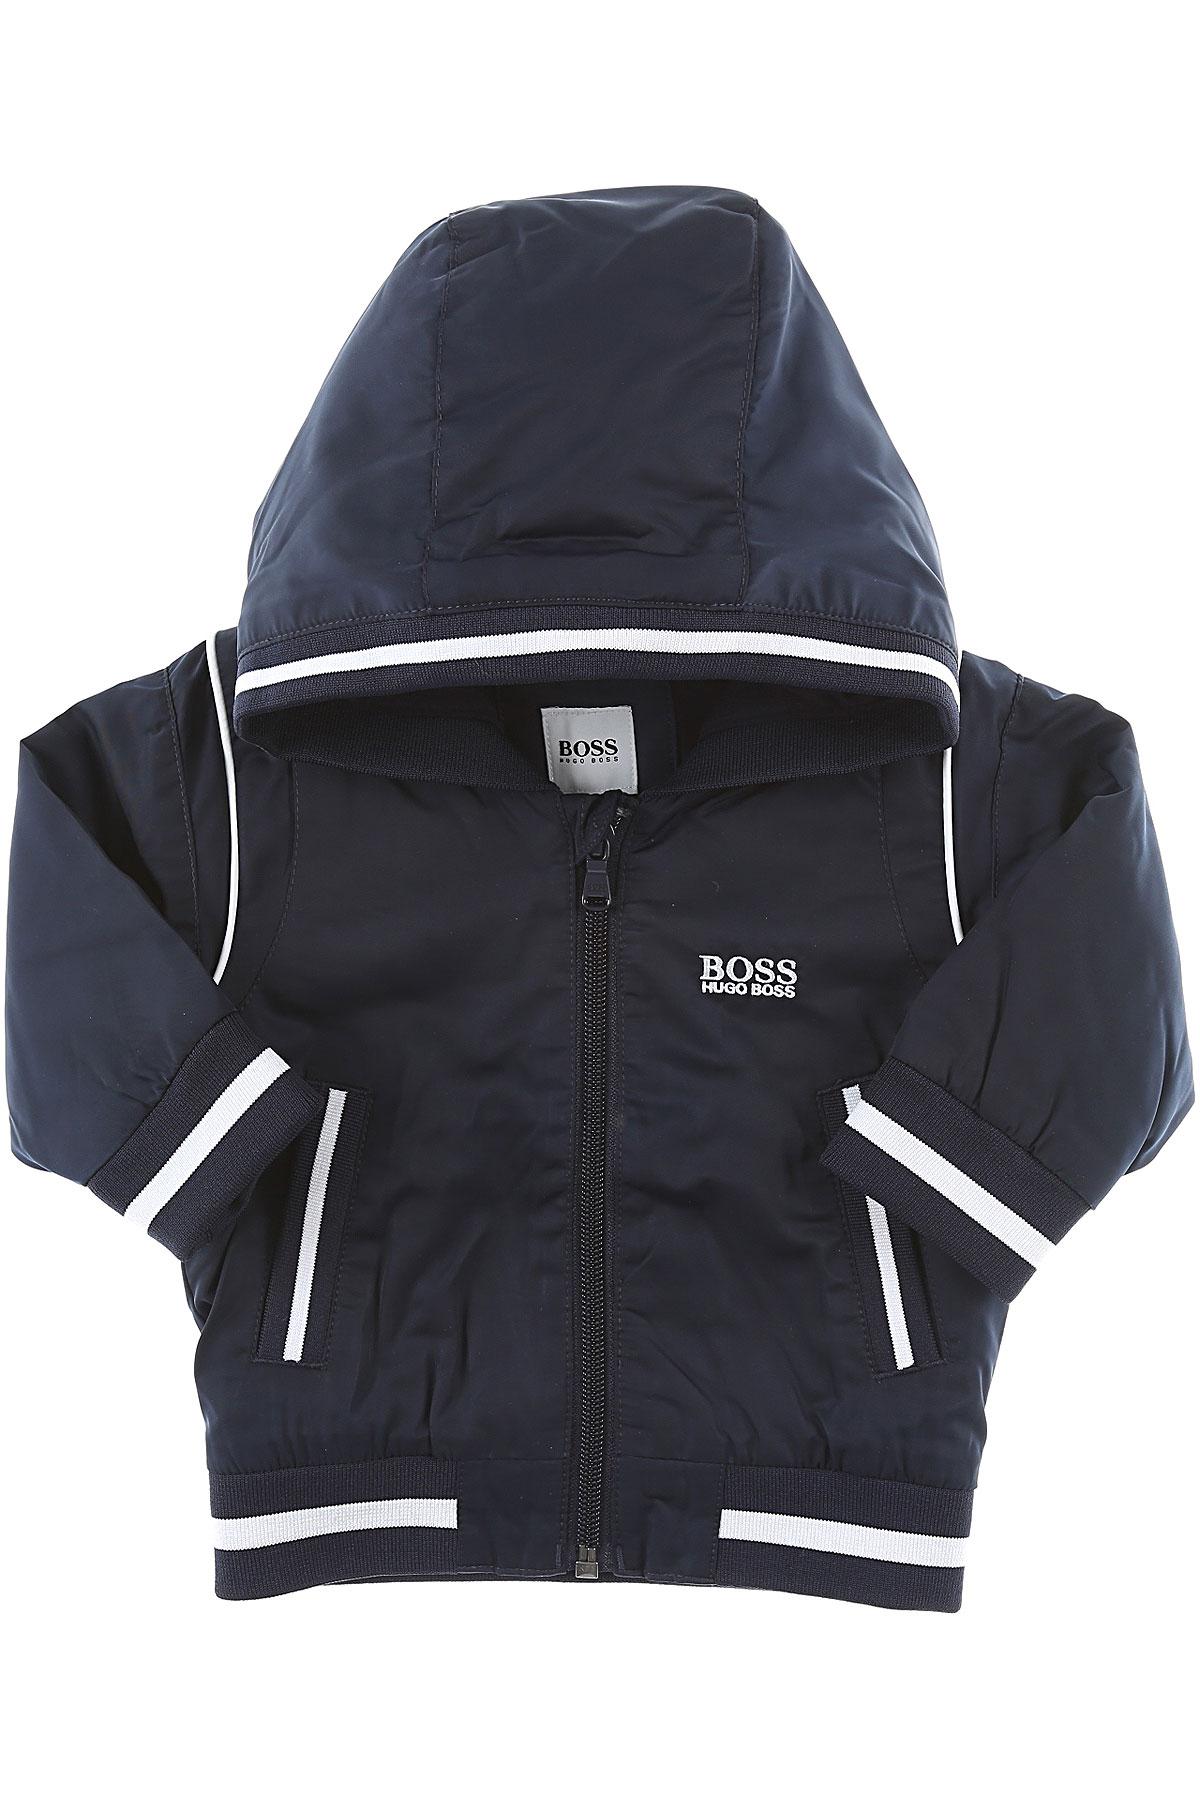 Image of Hugo Boss Baby Boy Clothing, Midnight Blue, polyester, 2017, 18M 2Y 6M 9M